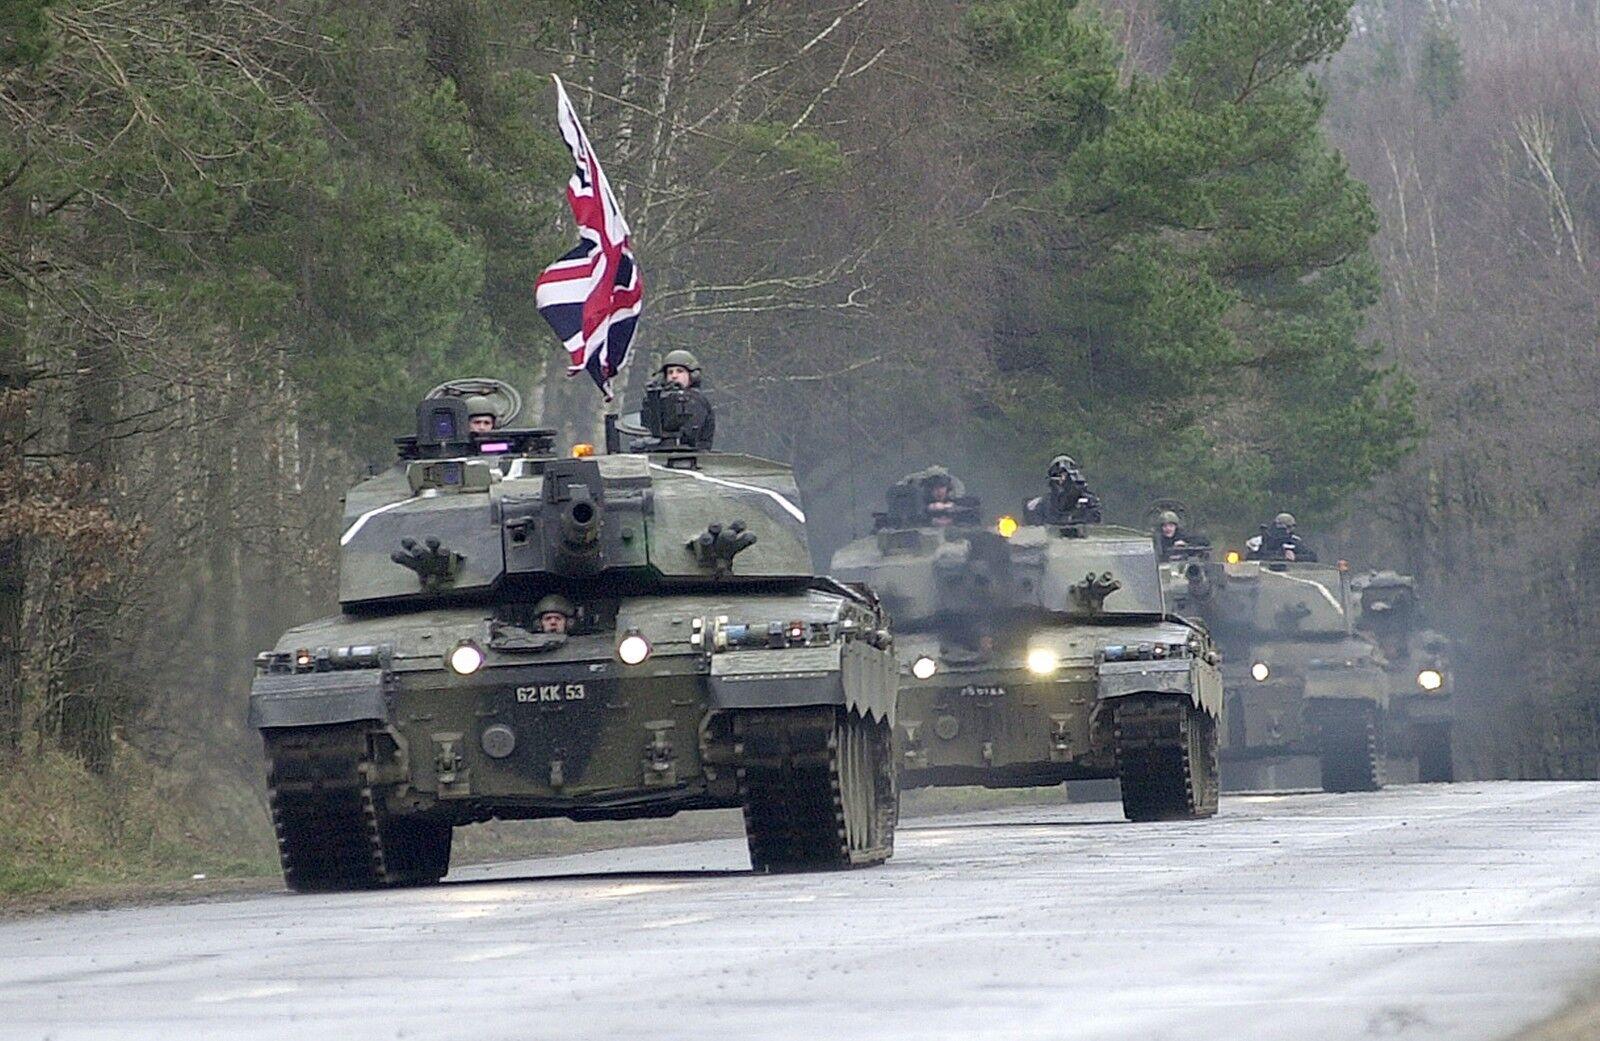 2nd Royal Tank Regiment CHALLENGER 2.     Military Photo Print